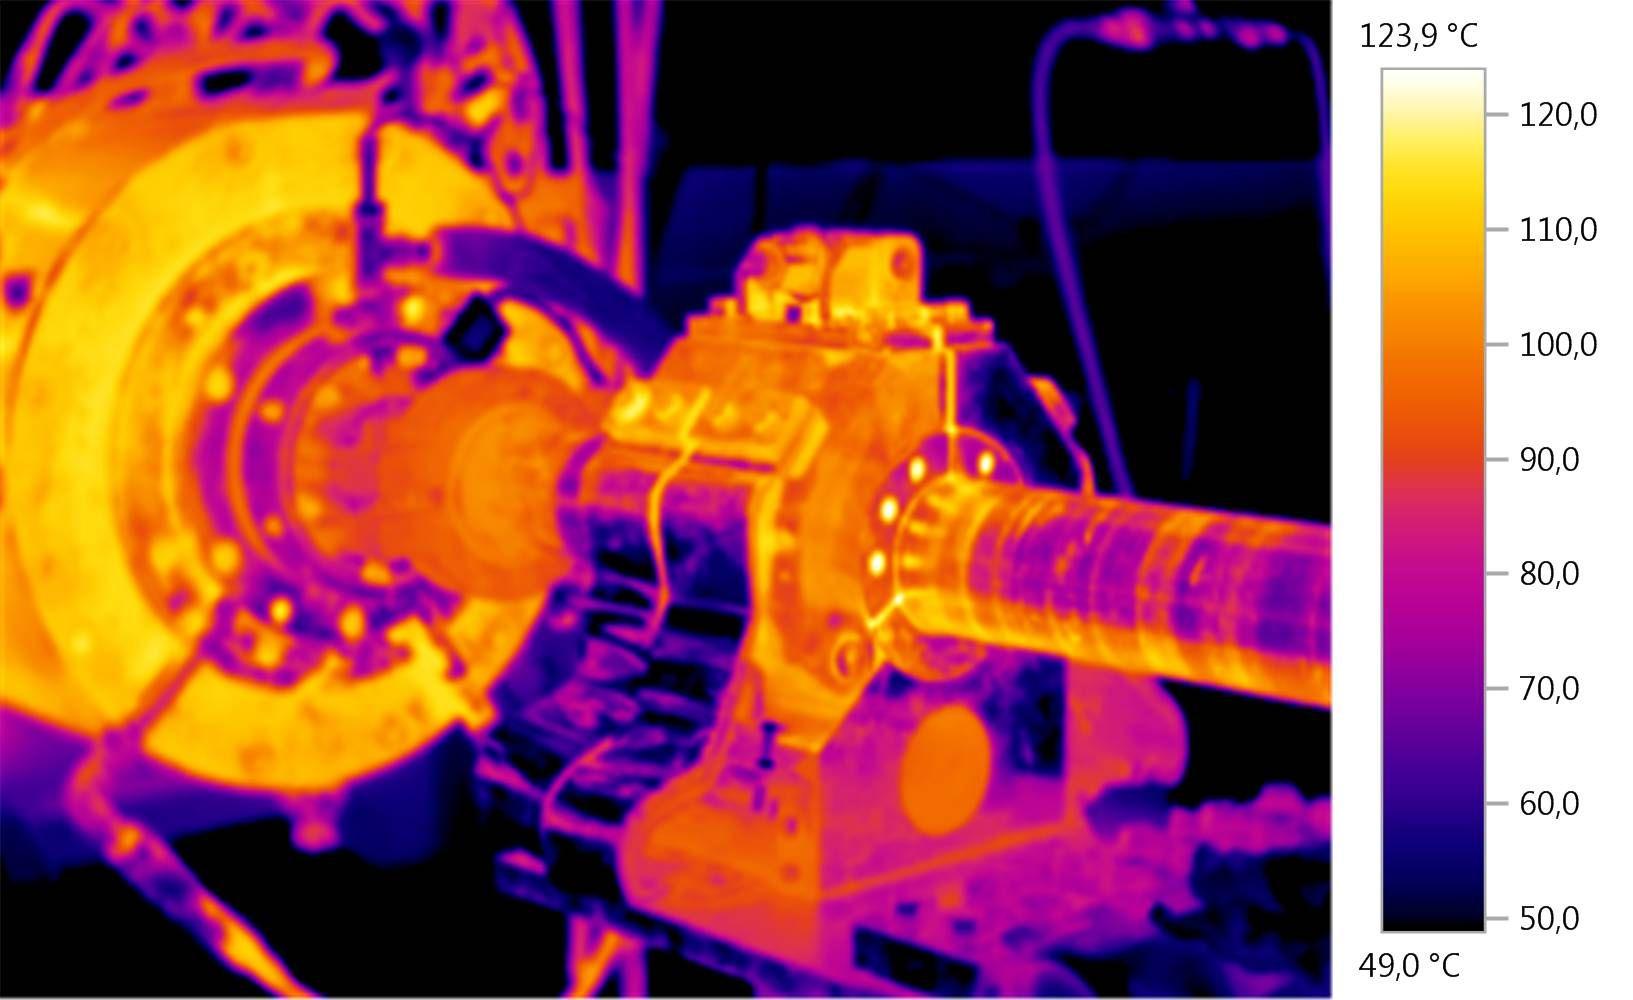 0560-0882-ir-application-testo-882-mechanical-maintenance.png